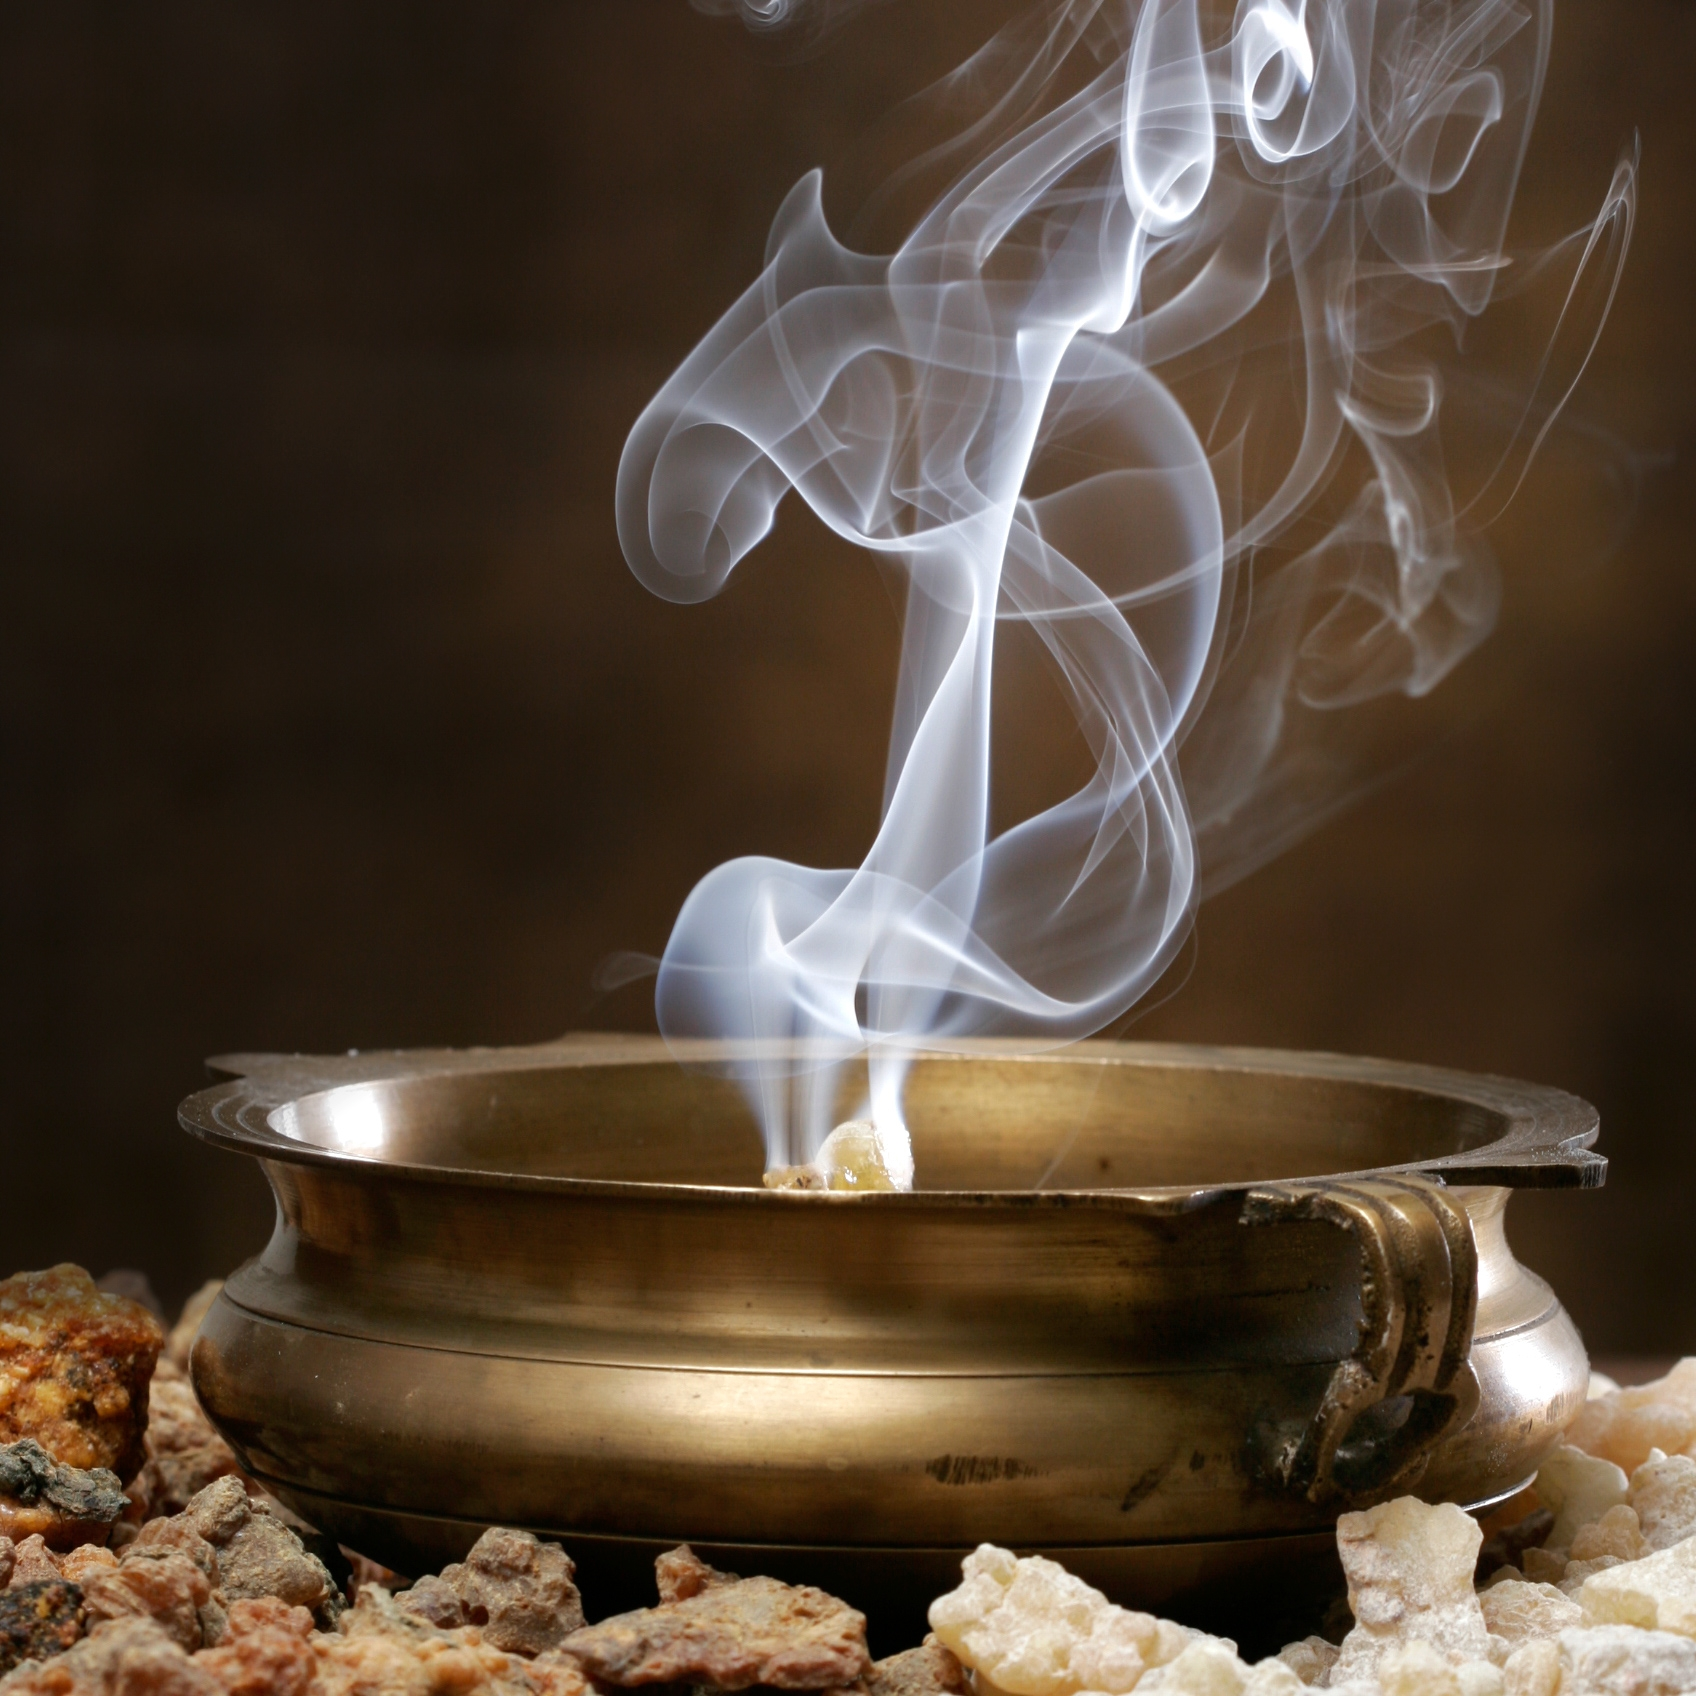 Frankincense & Myrrh  – A rich, earthy blend of frankincense, myrrh and a twist of orange bergamot.